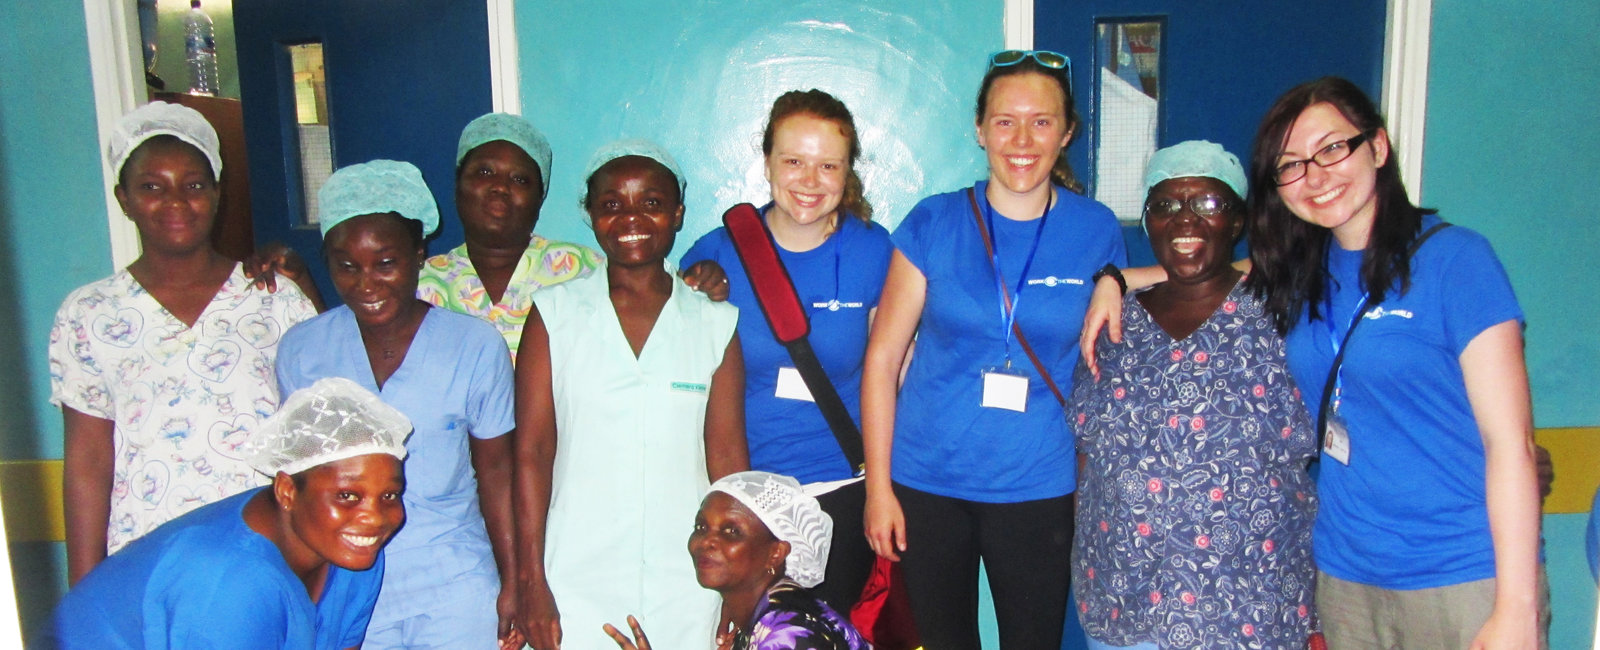 Amanda Green - Midwifery Electives in Ghana Takoradi